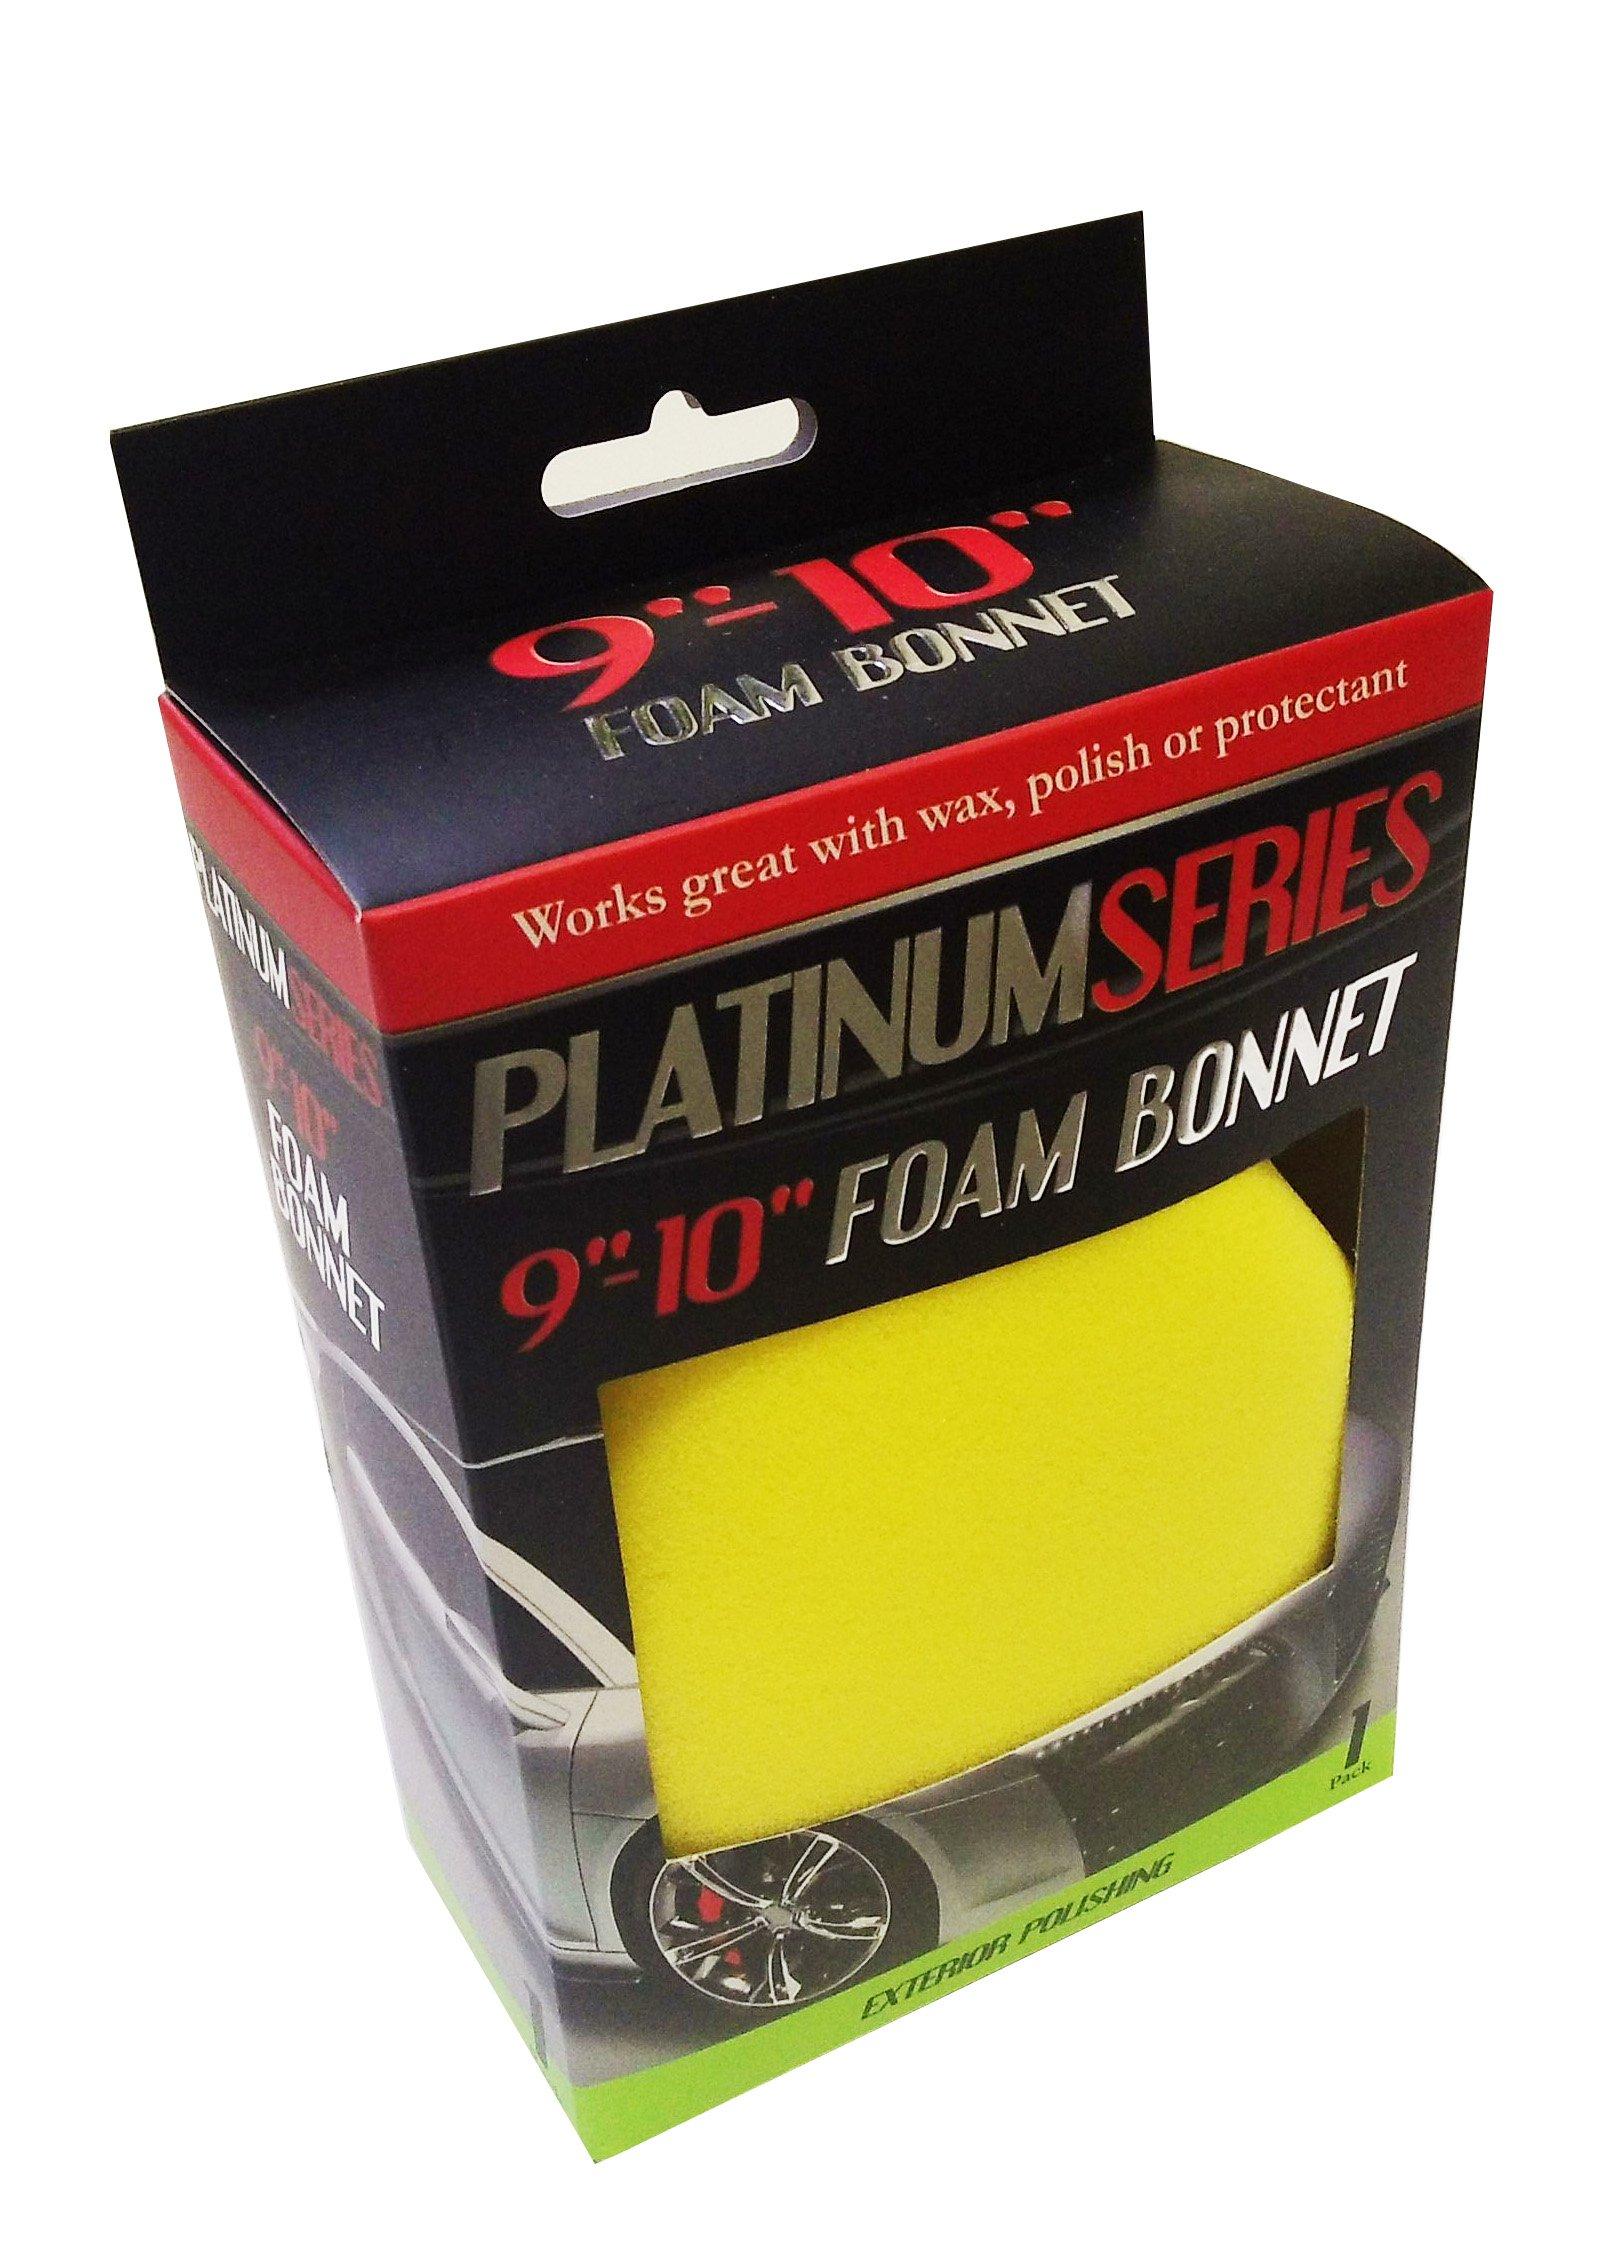 "Microtex R-878100 Platinum Red 9"" - 10"" Foam Bonnet"